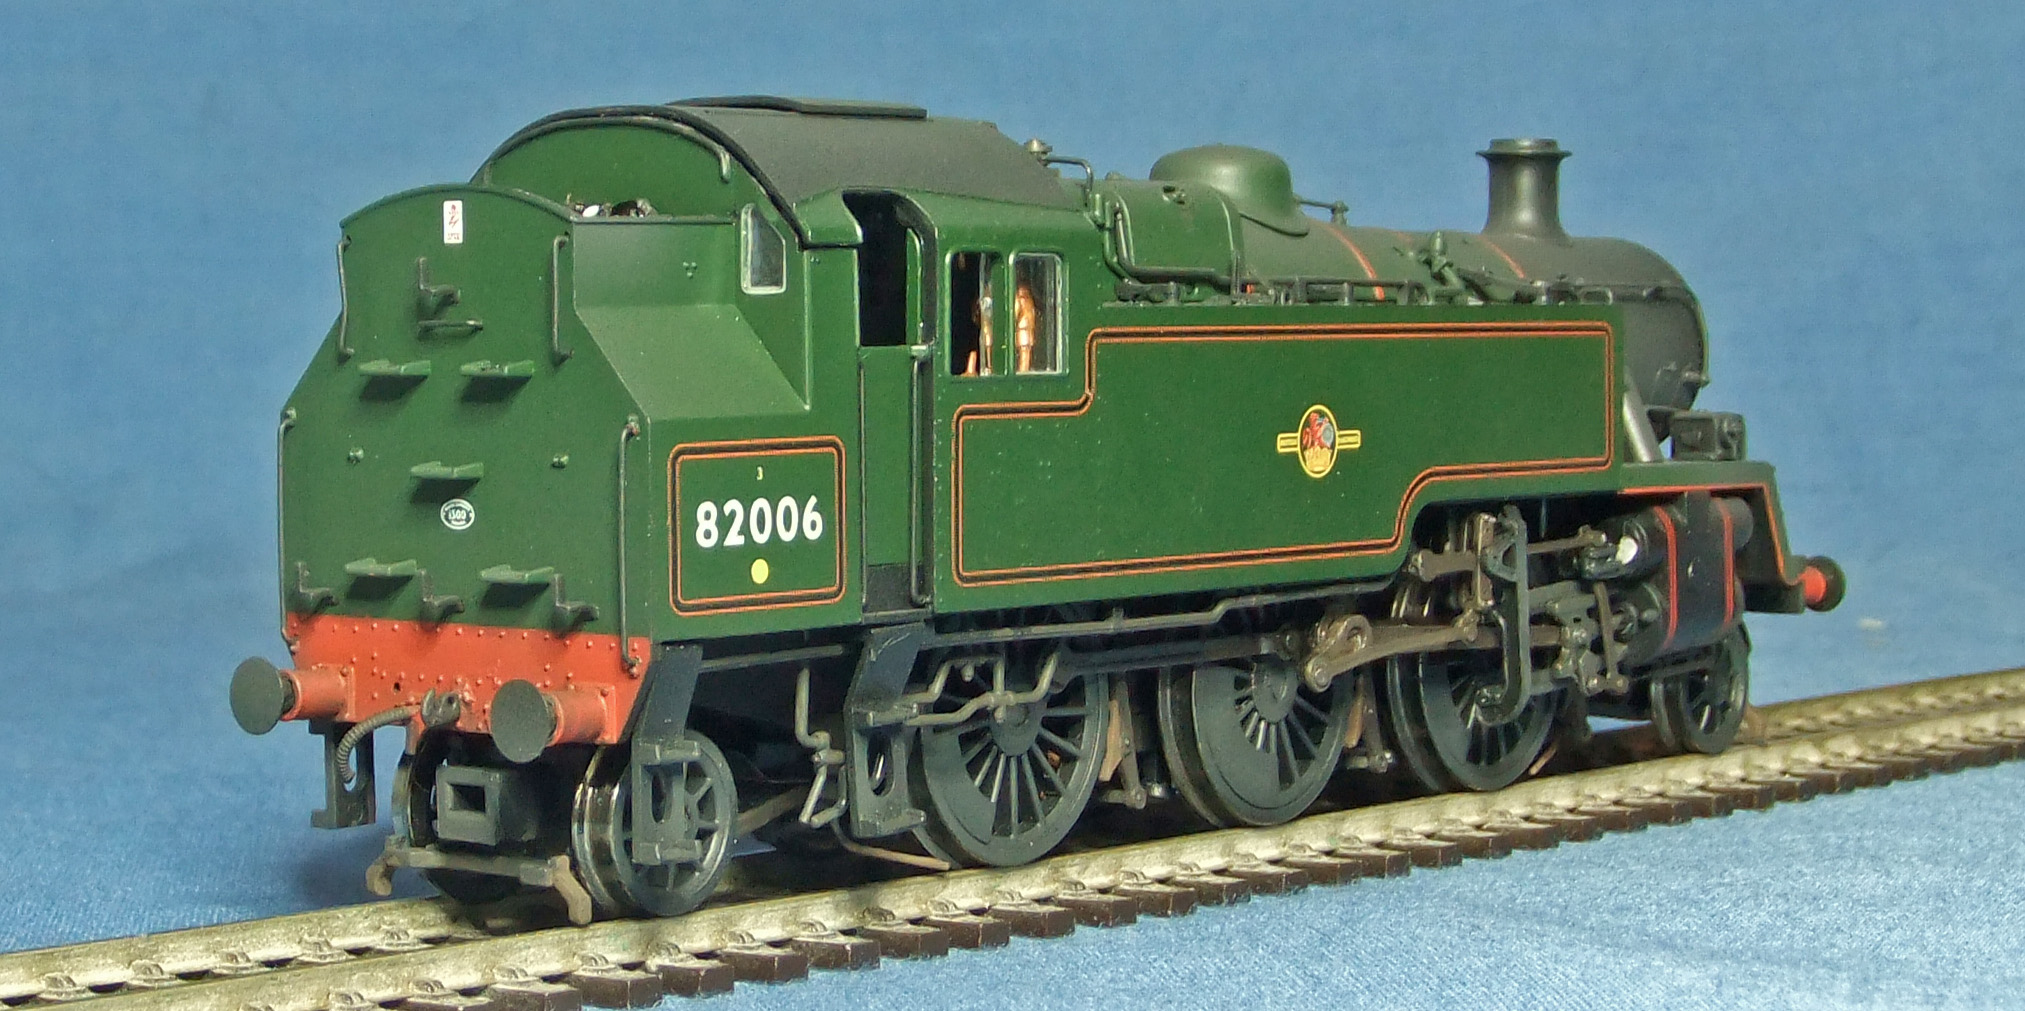 BR Standard Class 3MT No.82006 - 1